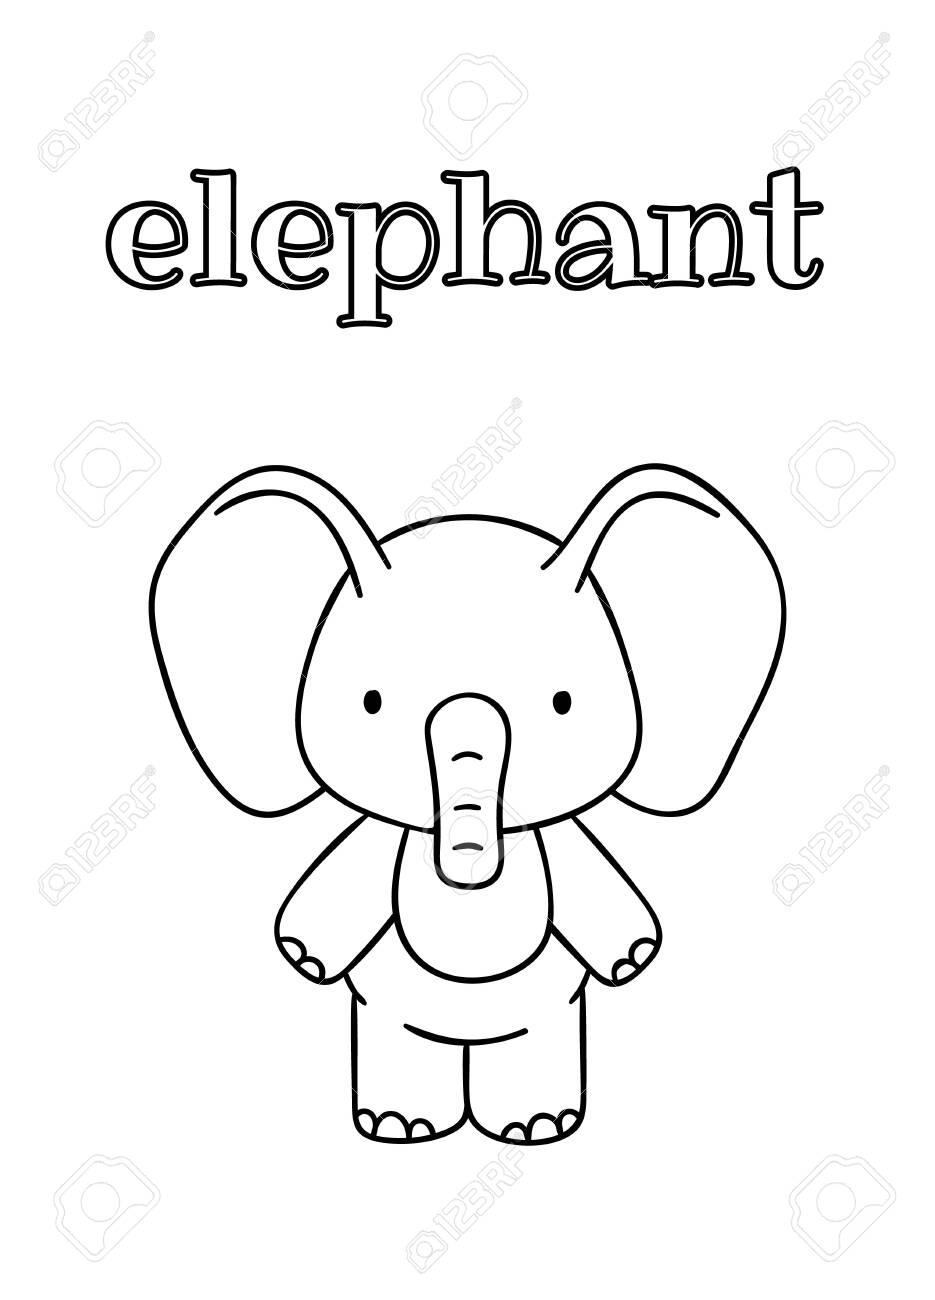 Cute Elephant Preschool Coloring Pages – coloring.rocks! | 1300x935